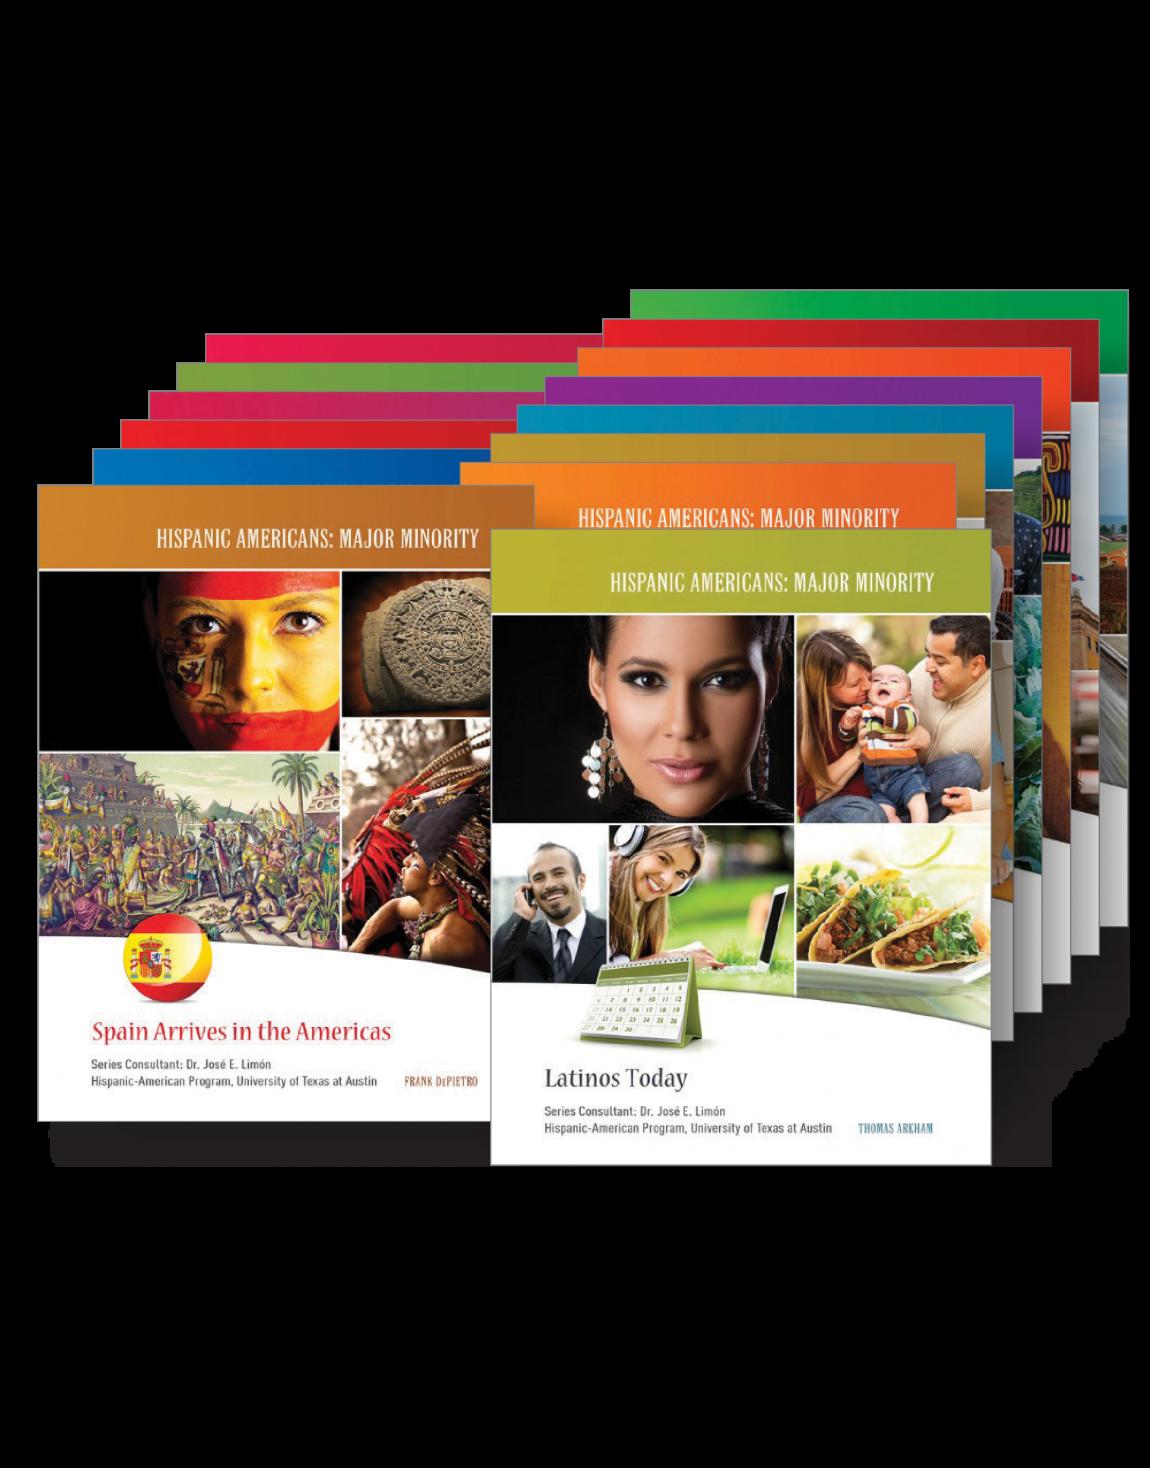 Hispanic-Americans-Major-Minority-01-1.png